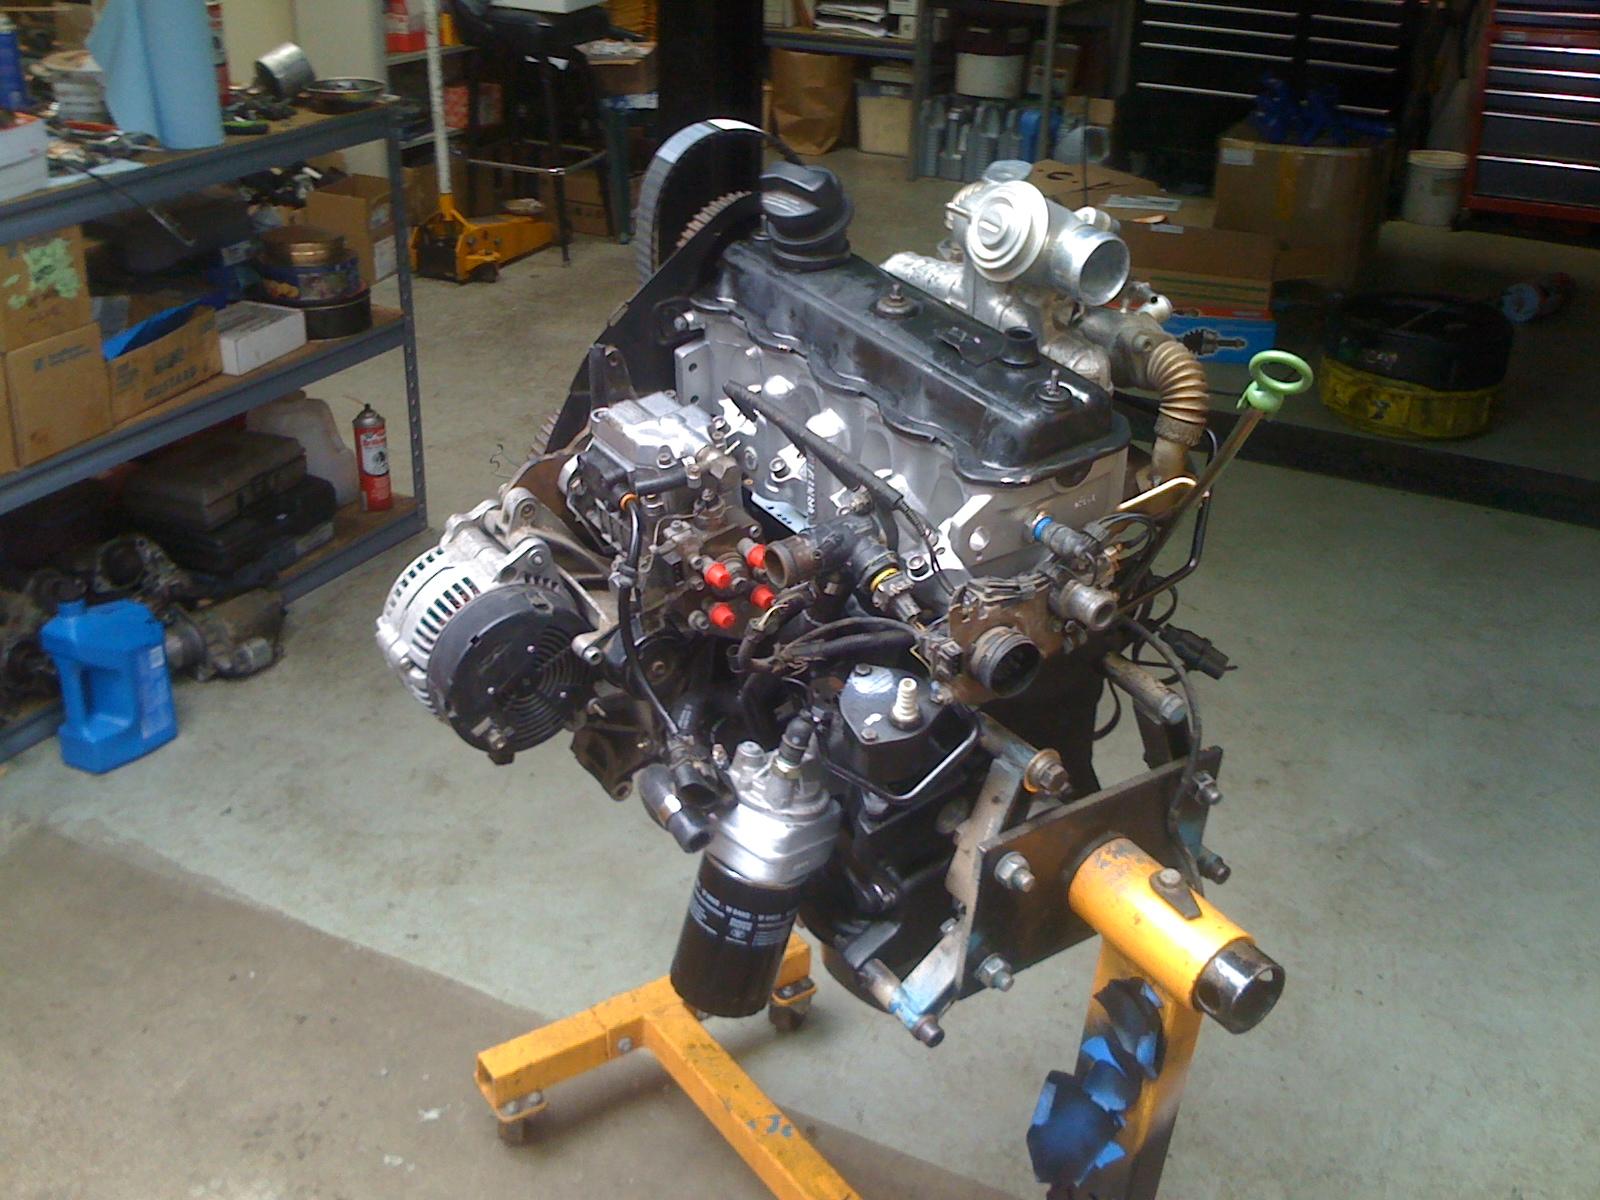 Grease Works shop notes: Eurovan 4-cyl AHU TDI engine/trans